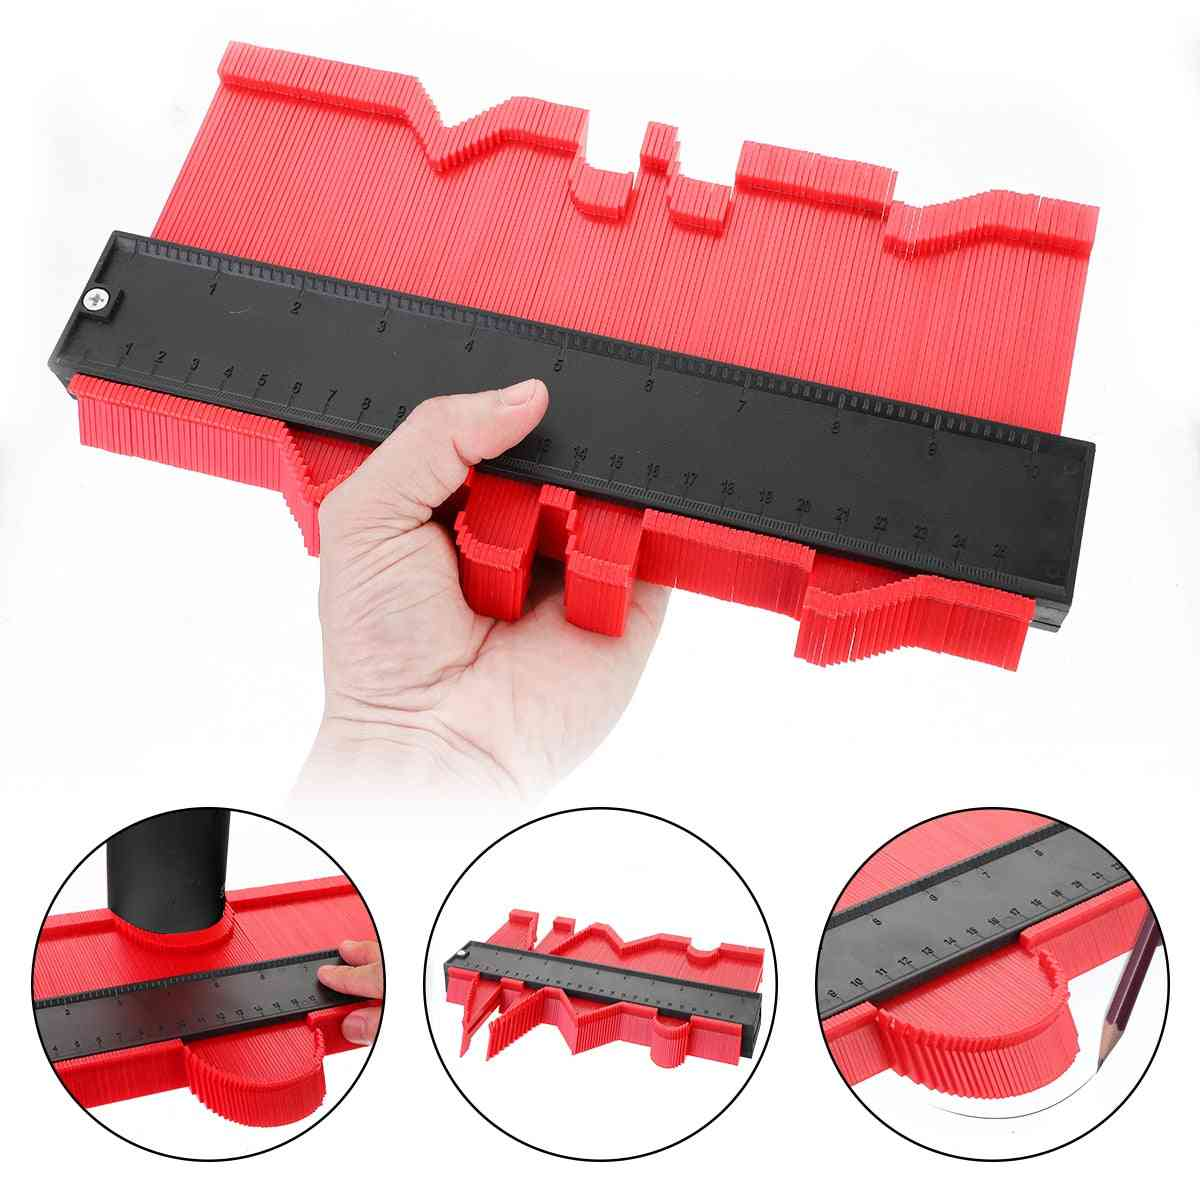 Contour Gauge Plastic Profile Copy Standard Wood Marking Tool Tiling Laminate Tiles